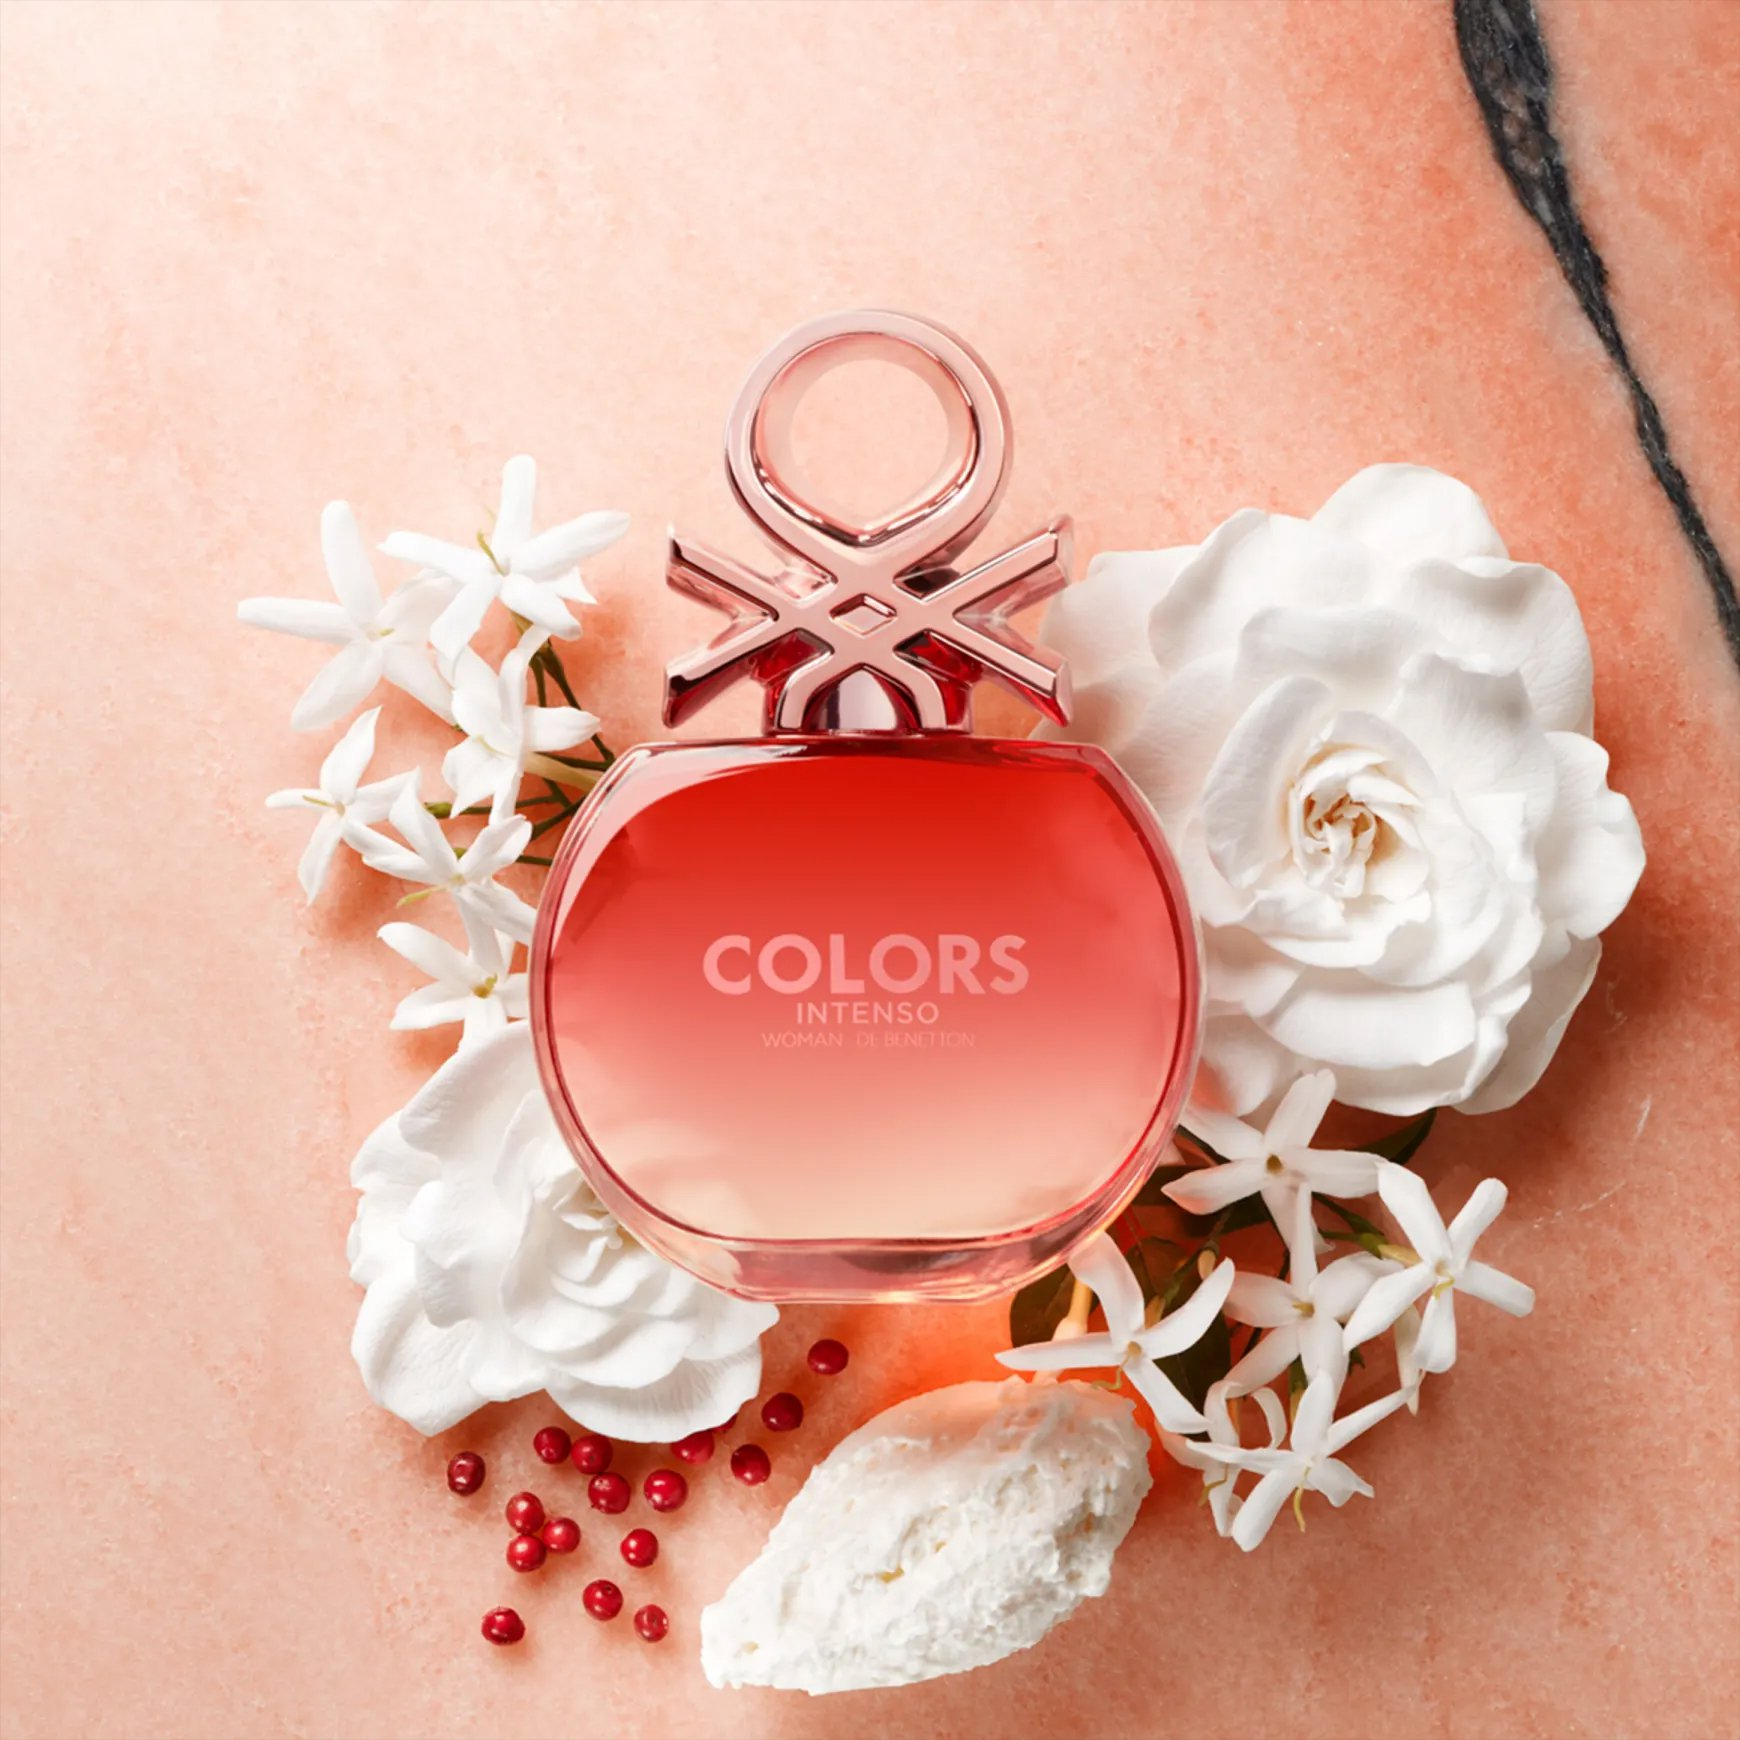 perfume benetton colors rose intenso feminino edp 80ml 51570 2000 204571 1